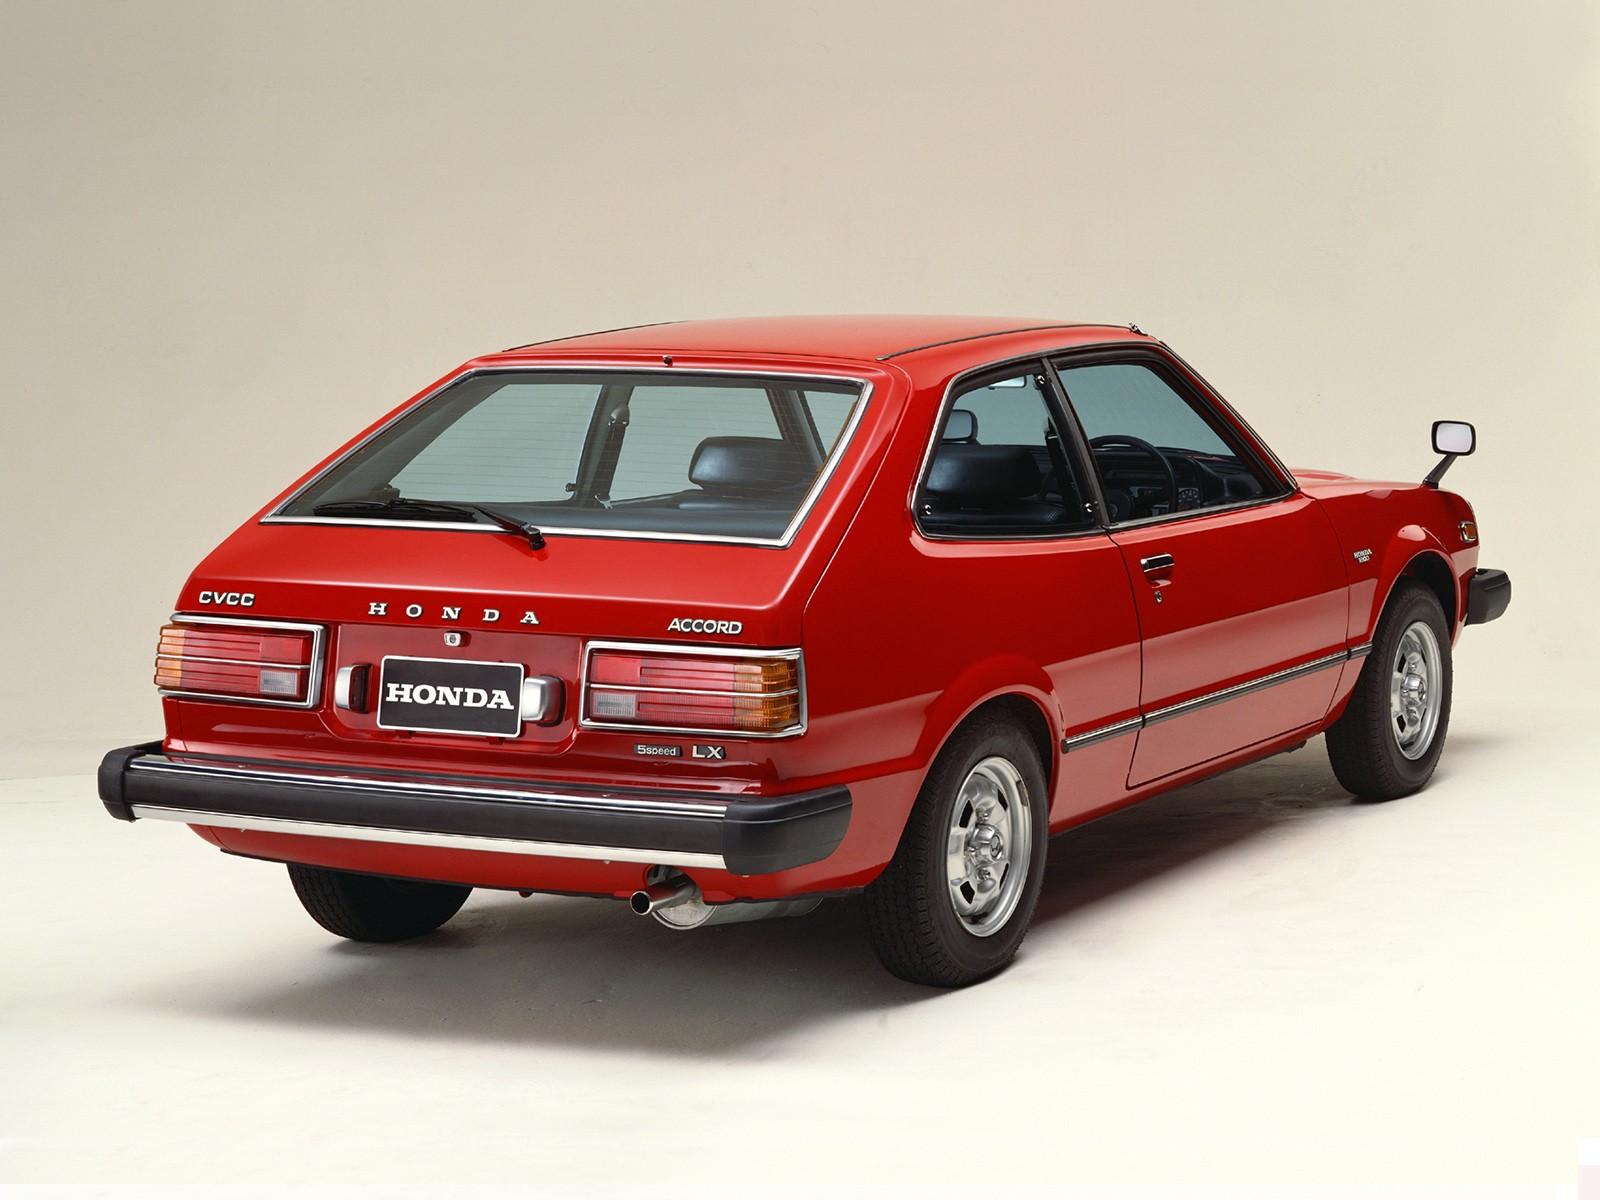 Honda Accord I 1976 - 1981 Hatchback 3 door #8